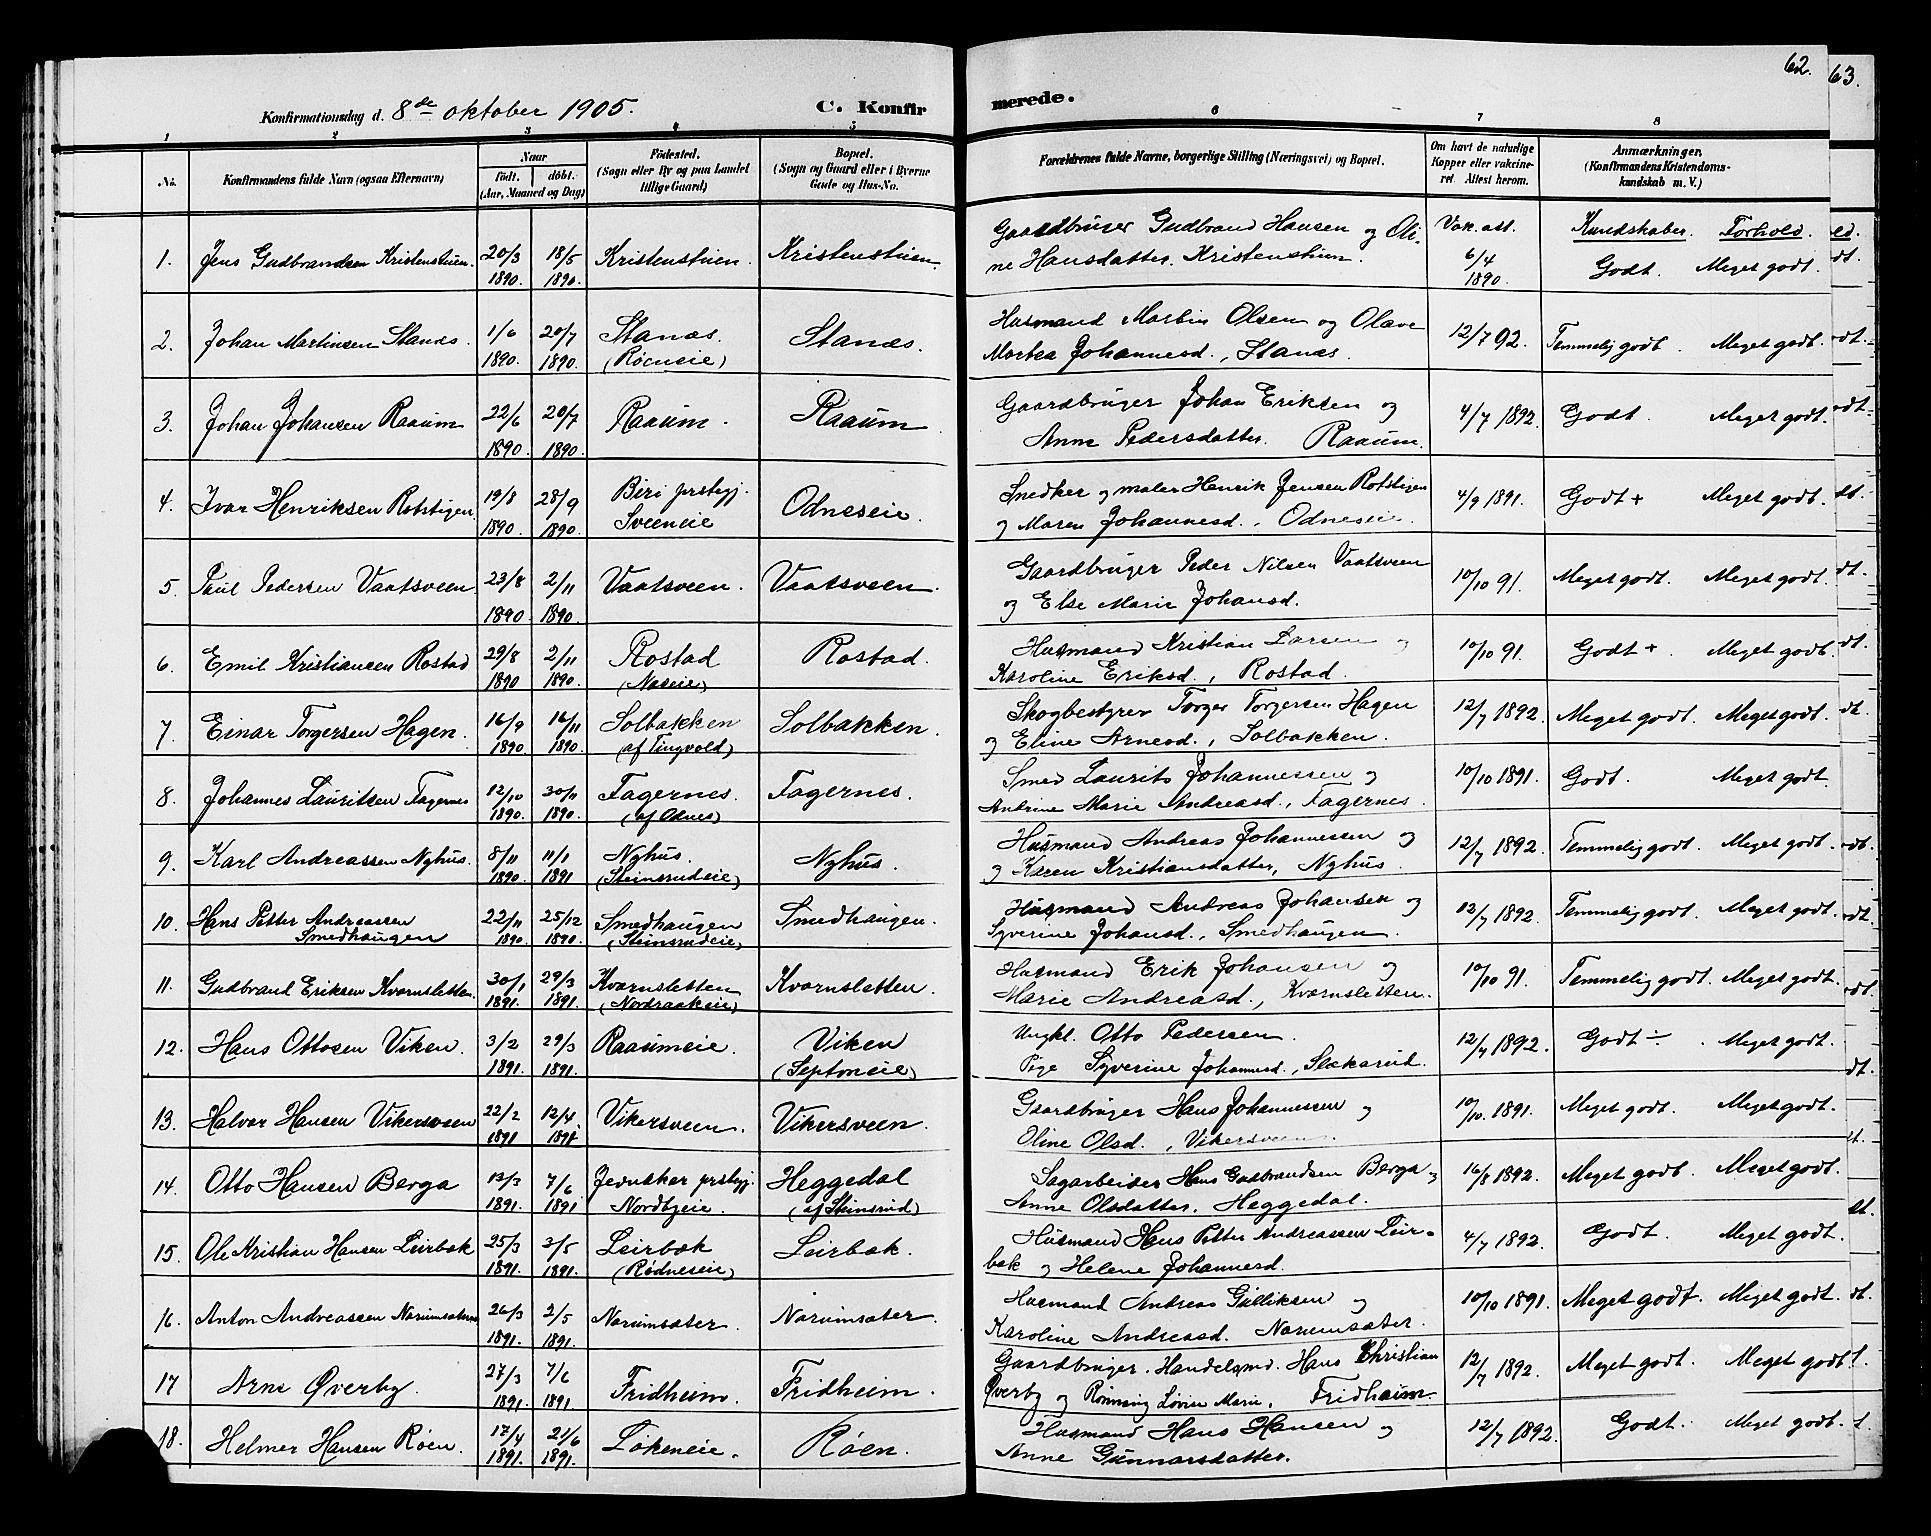 SAH, Søndre Land prestekontor, L/L0005: Klokkerbok nr. 5, 1902-1911, s. 62